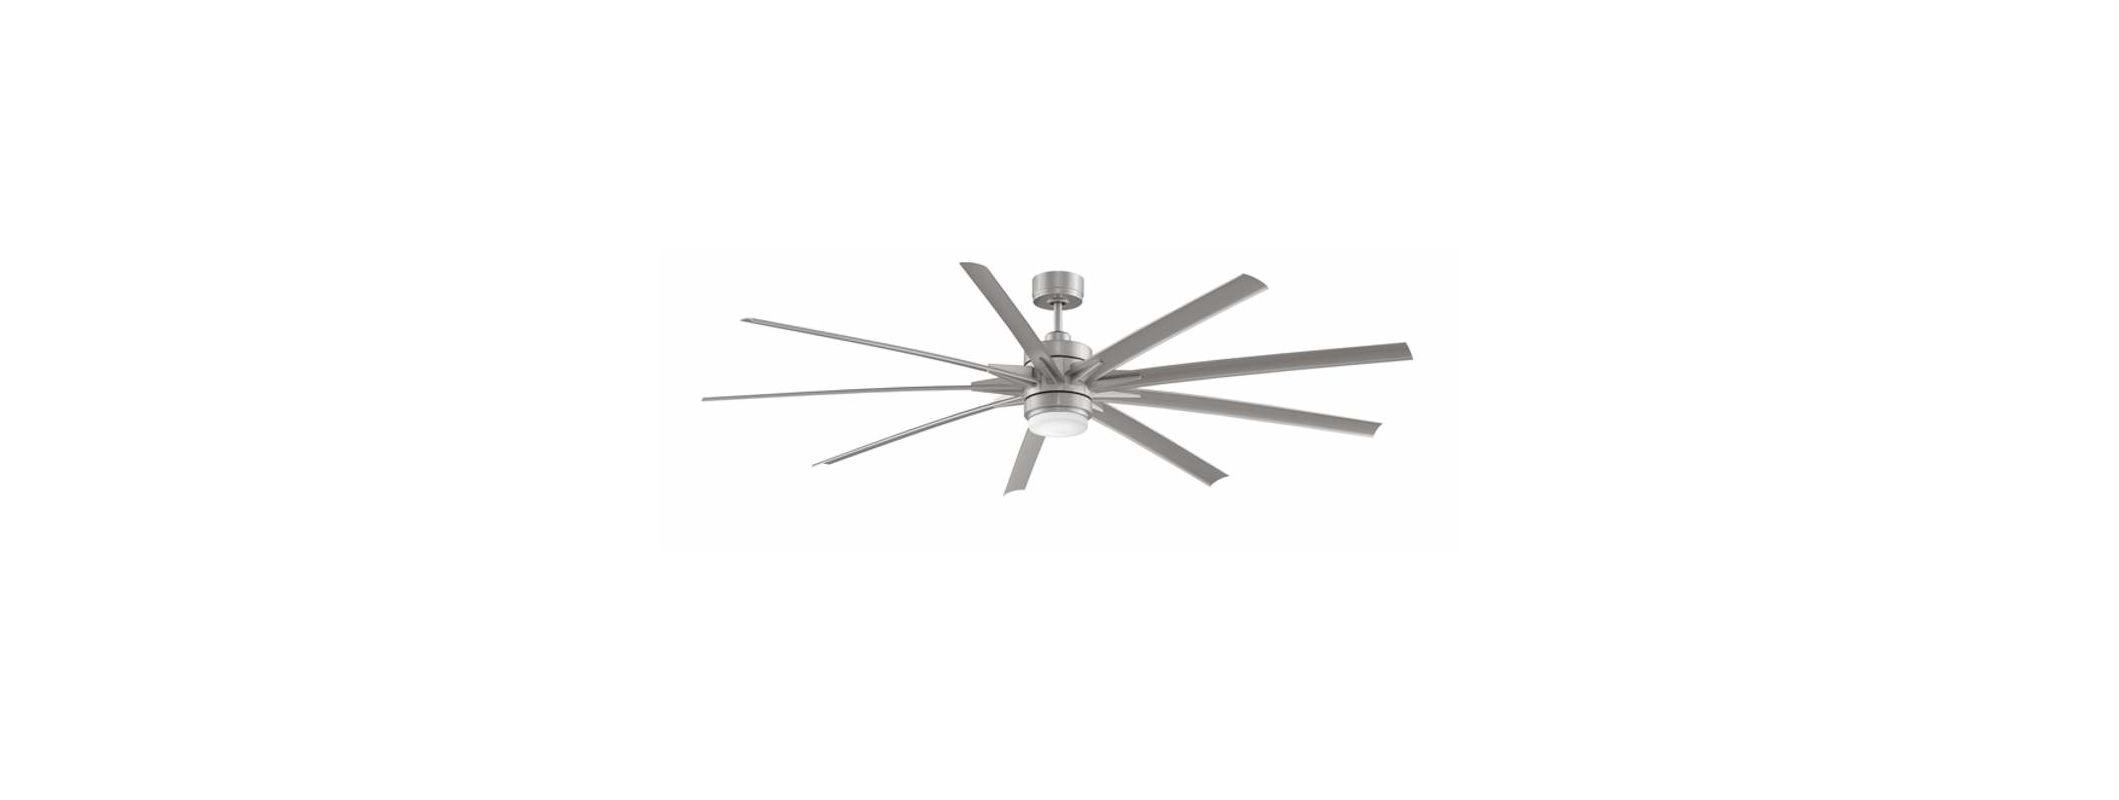 Fanimation FPD8148-220 Odyn 220V 9 Blade Indoor Commercial Ceiling Fan